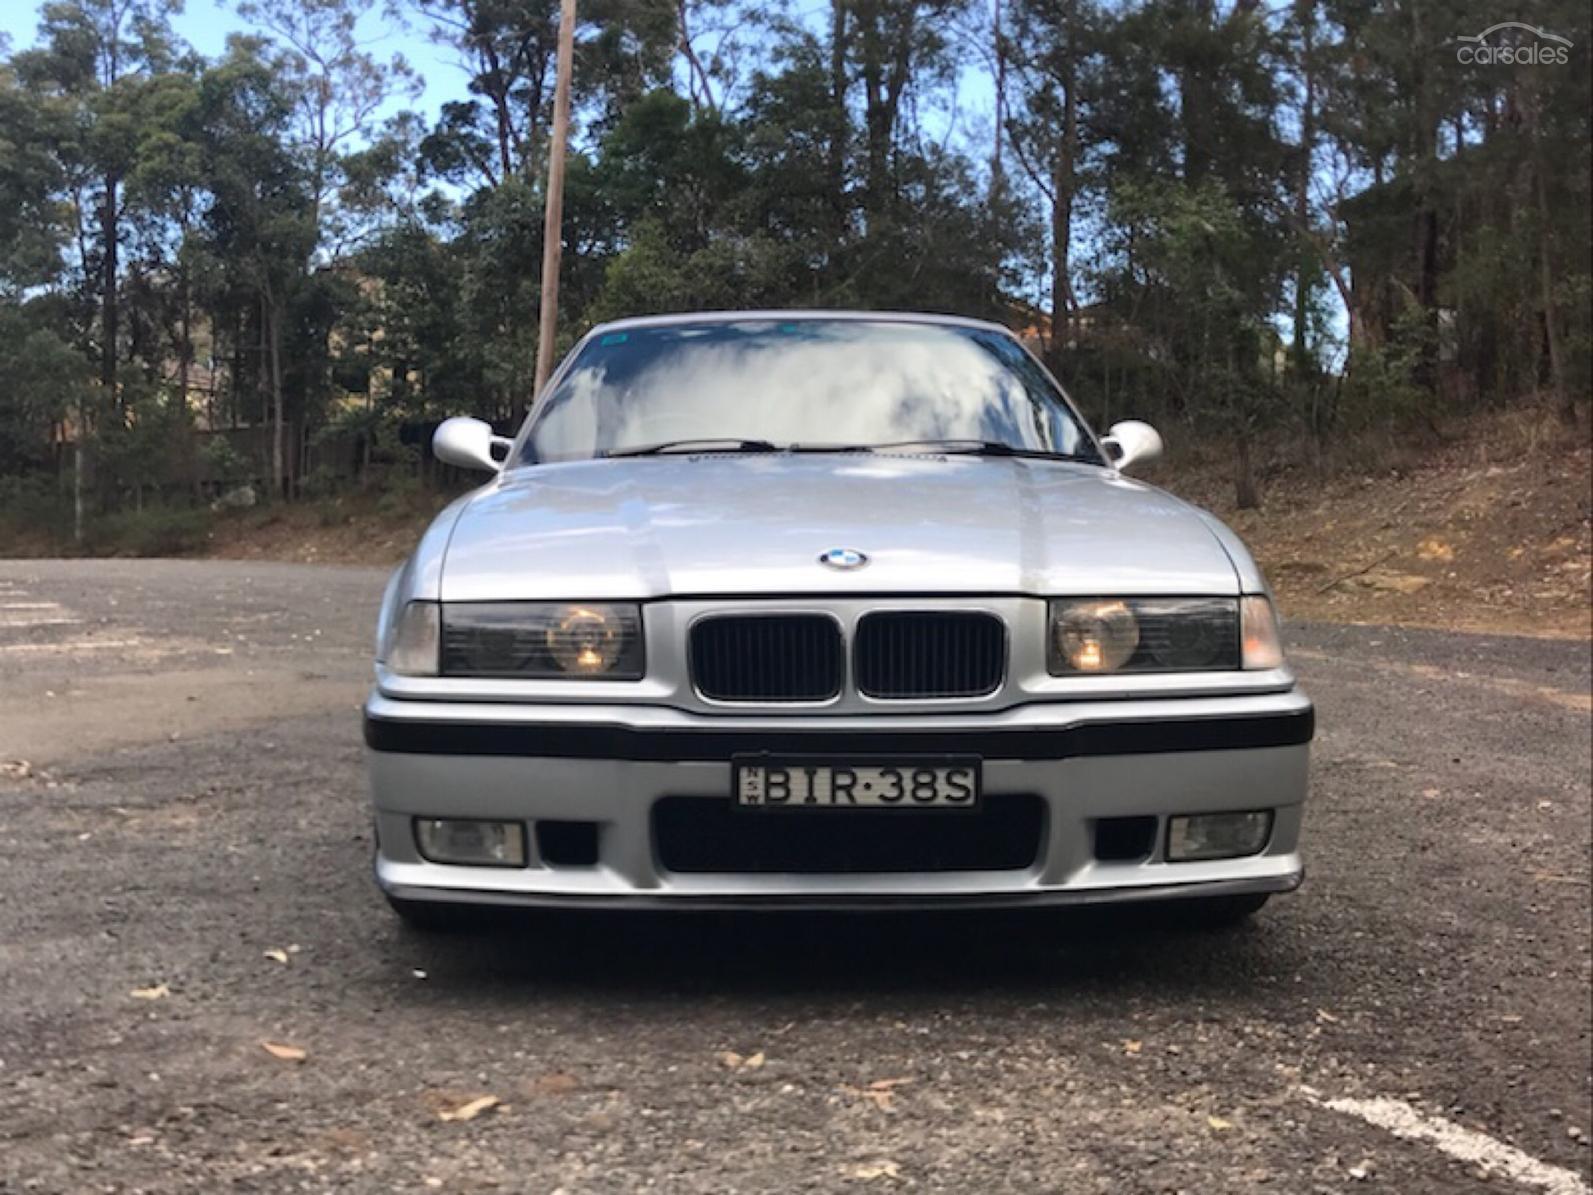 1994 BMW M3 E36 Manual-SSE-AD-5574862 - carsales com au